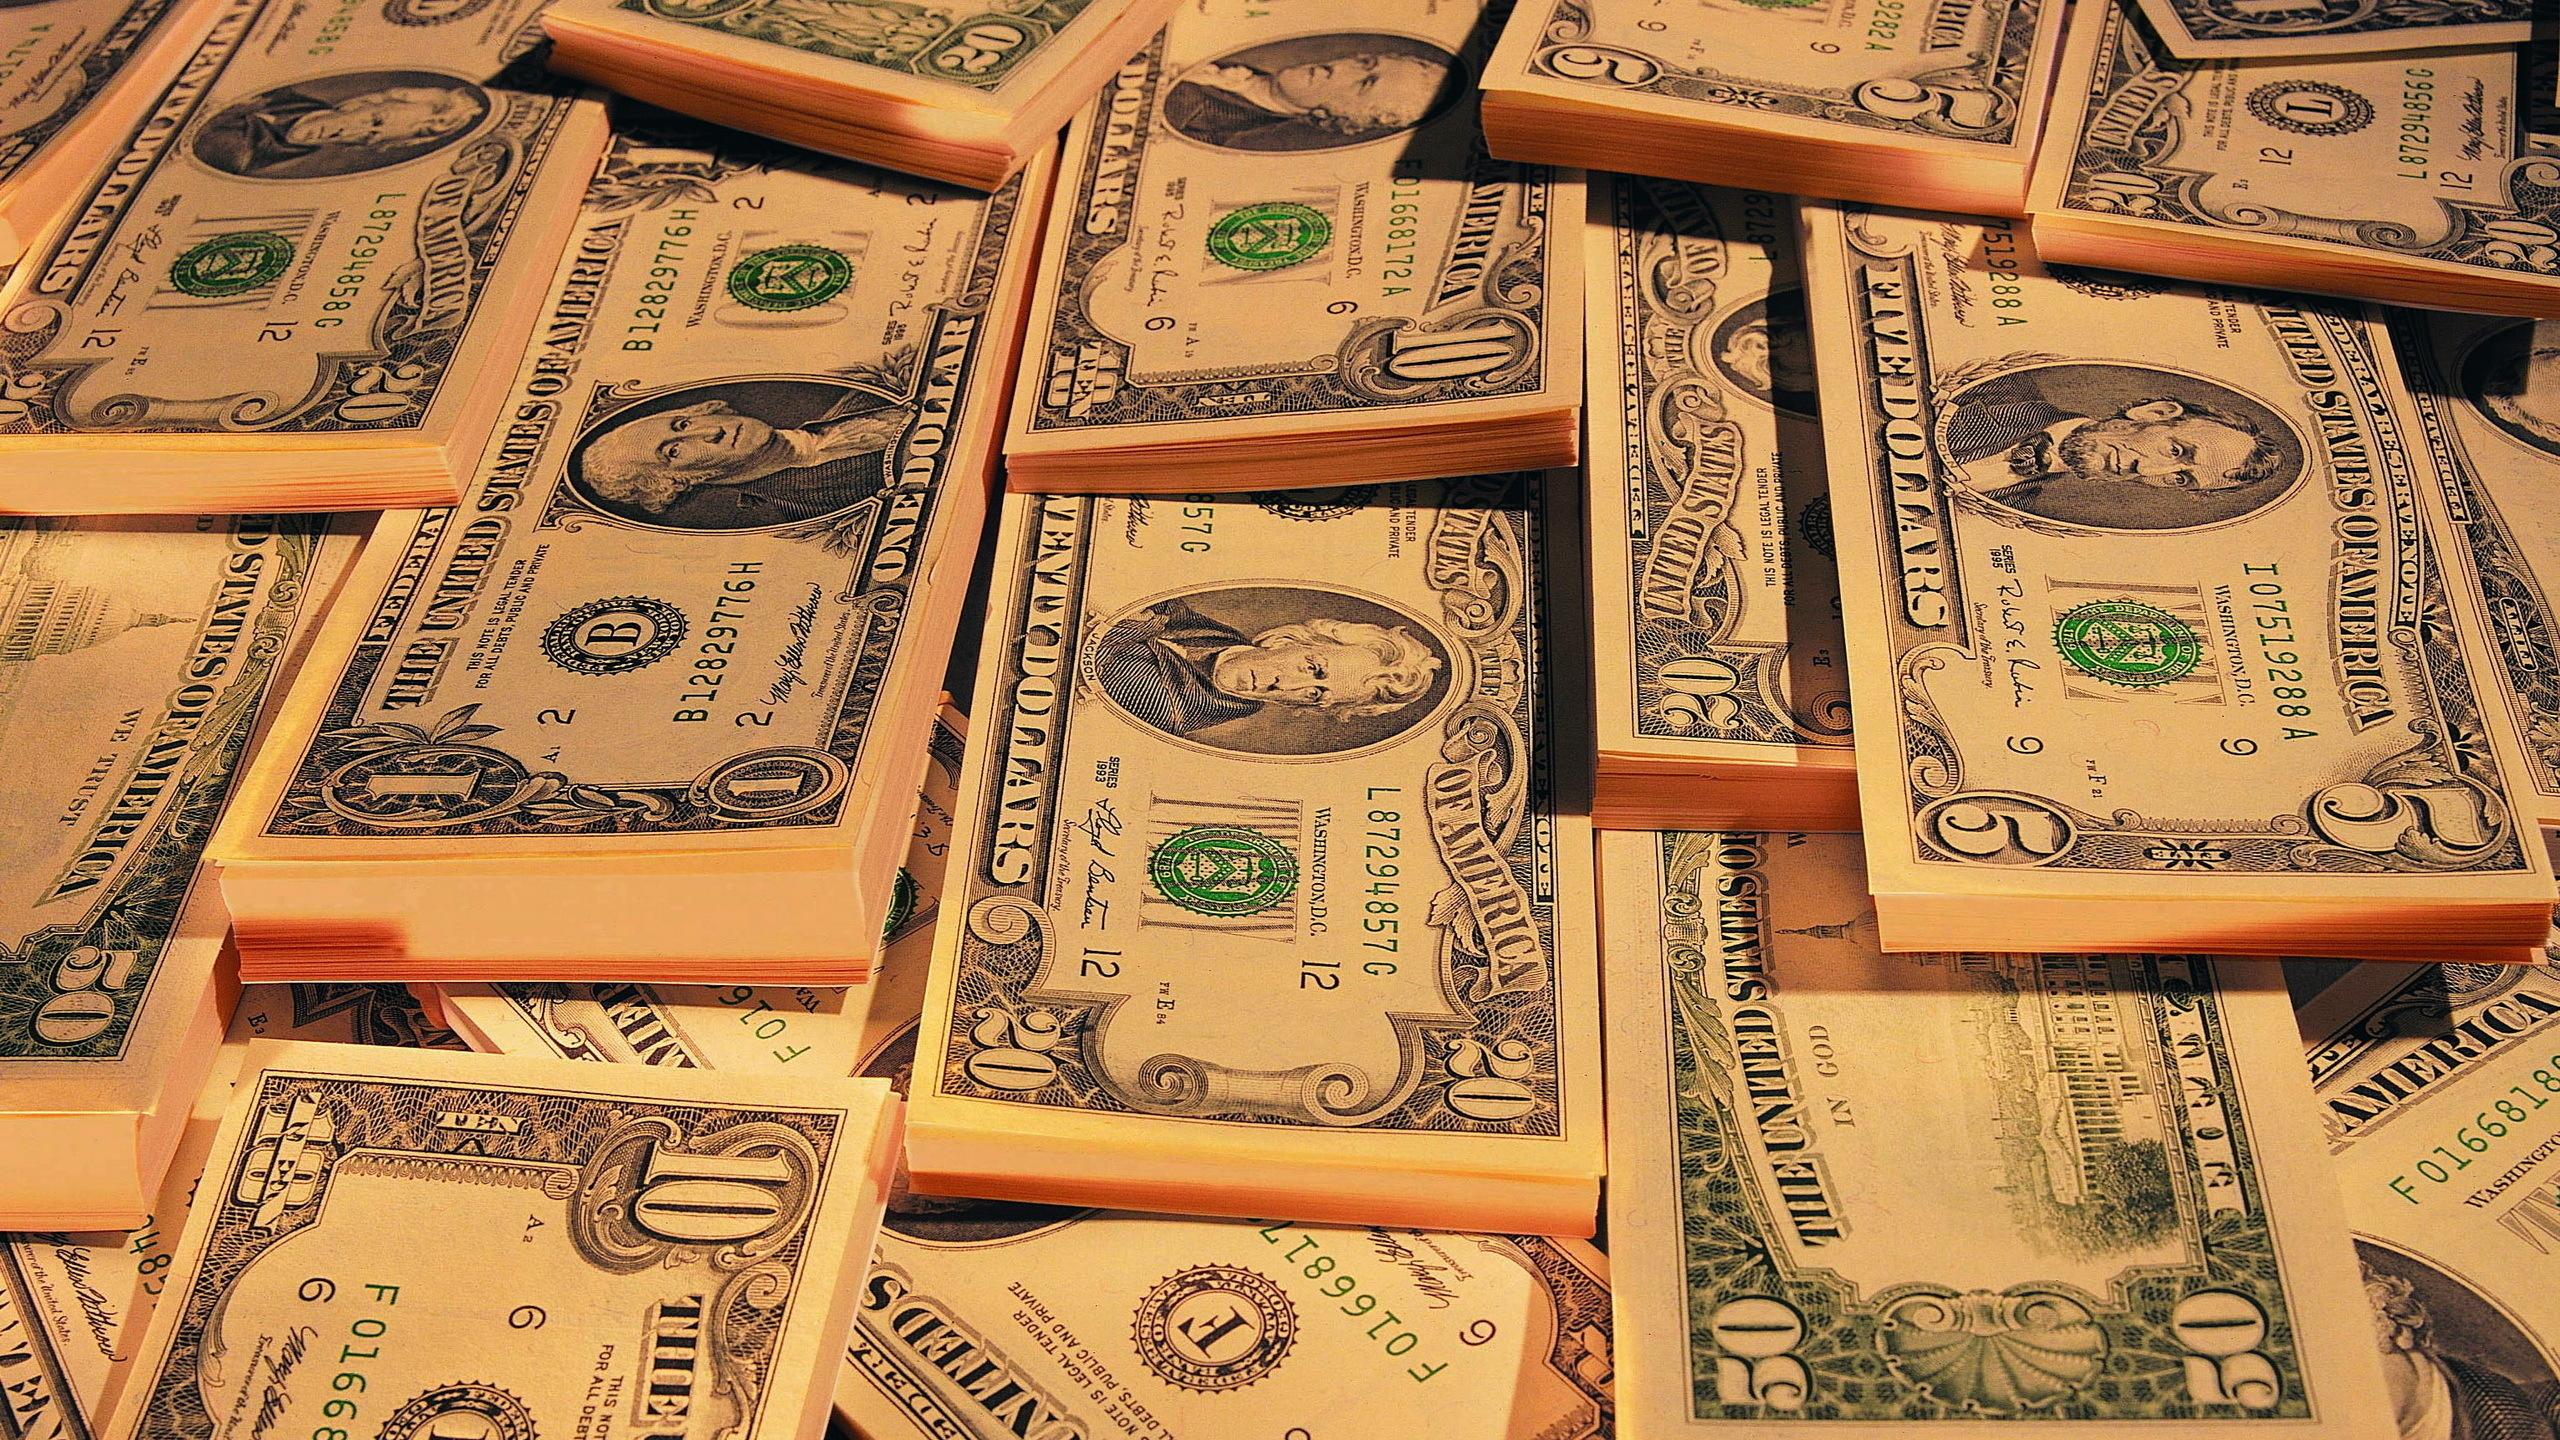 деньги доллары красивые картинки времени камеру